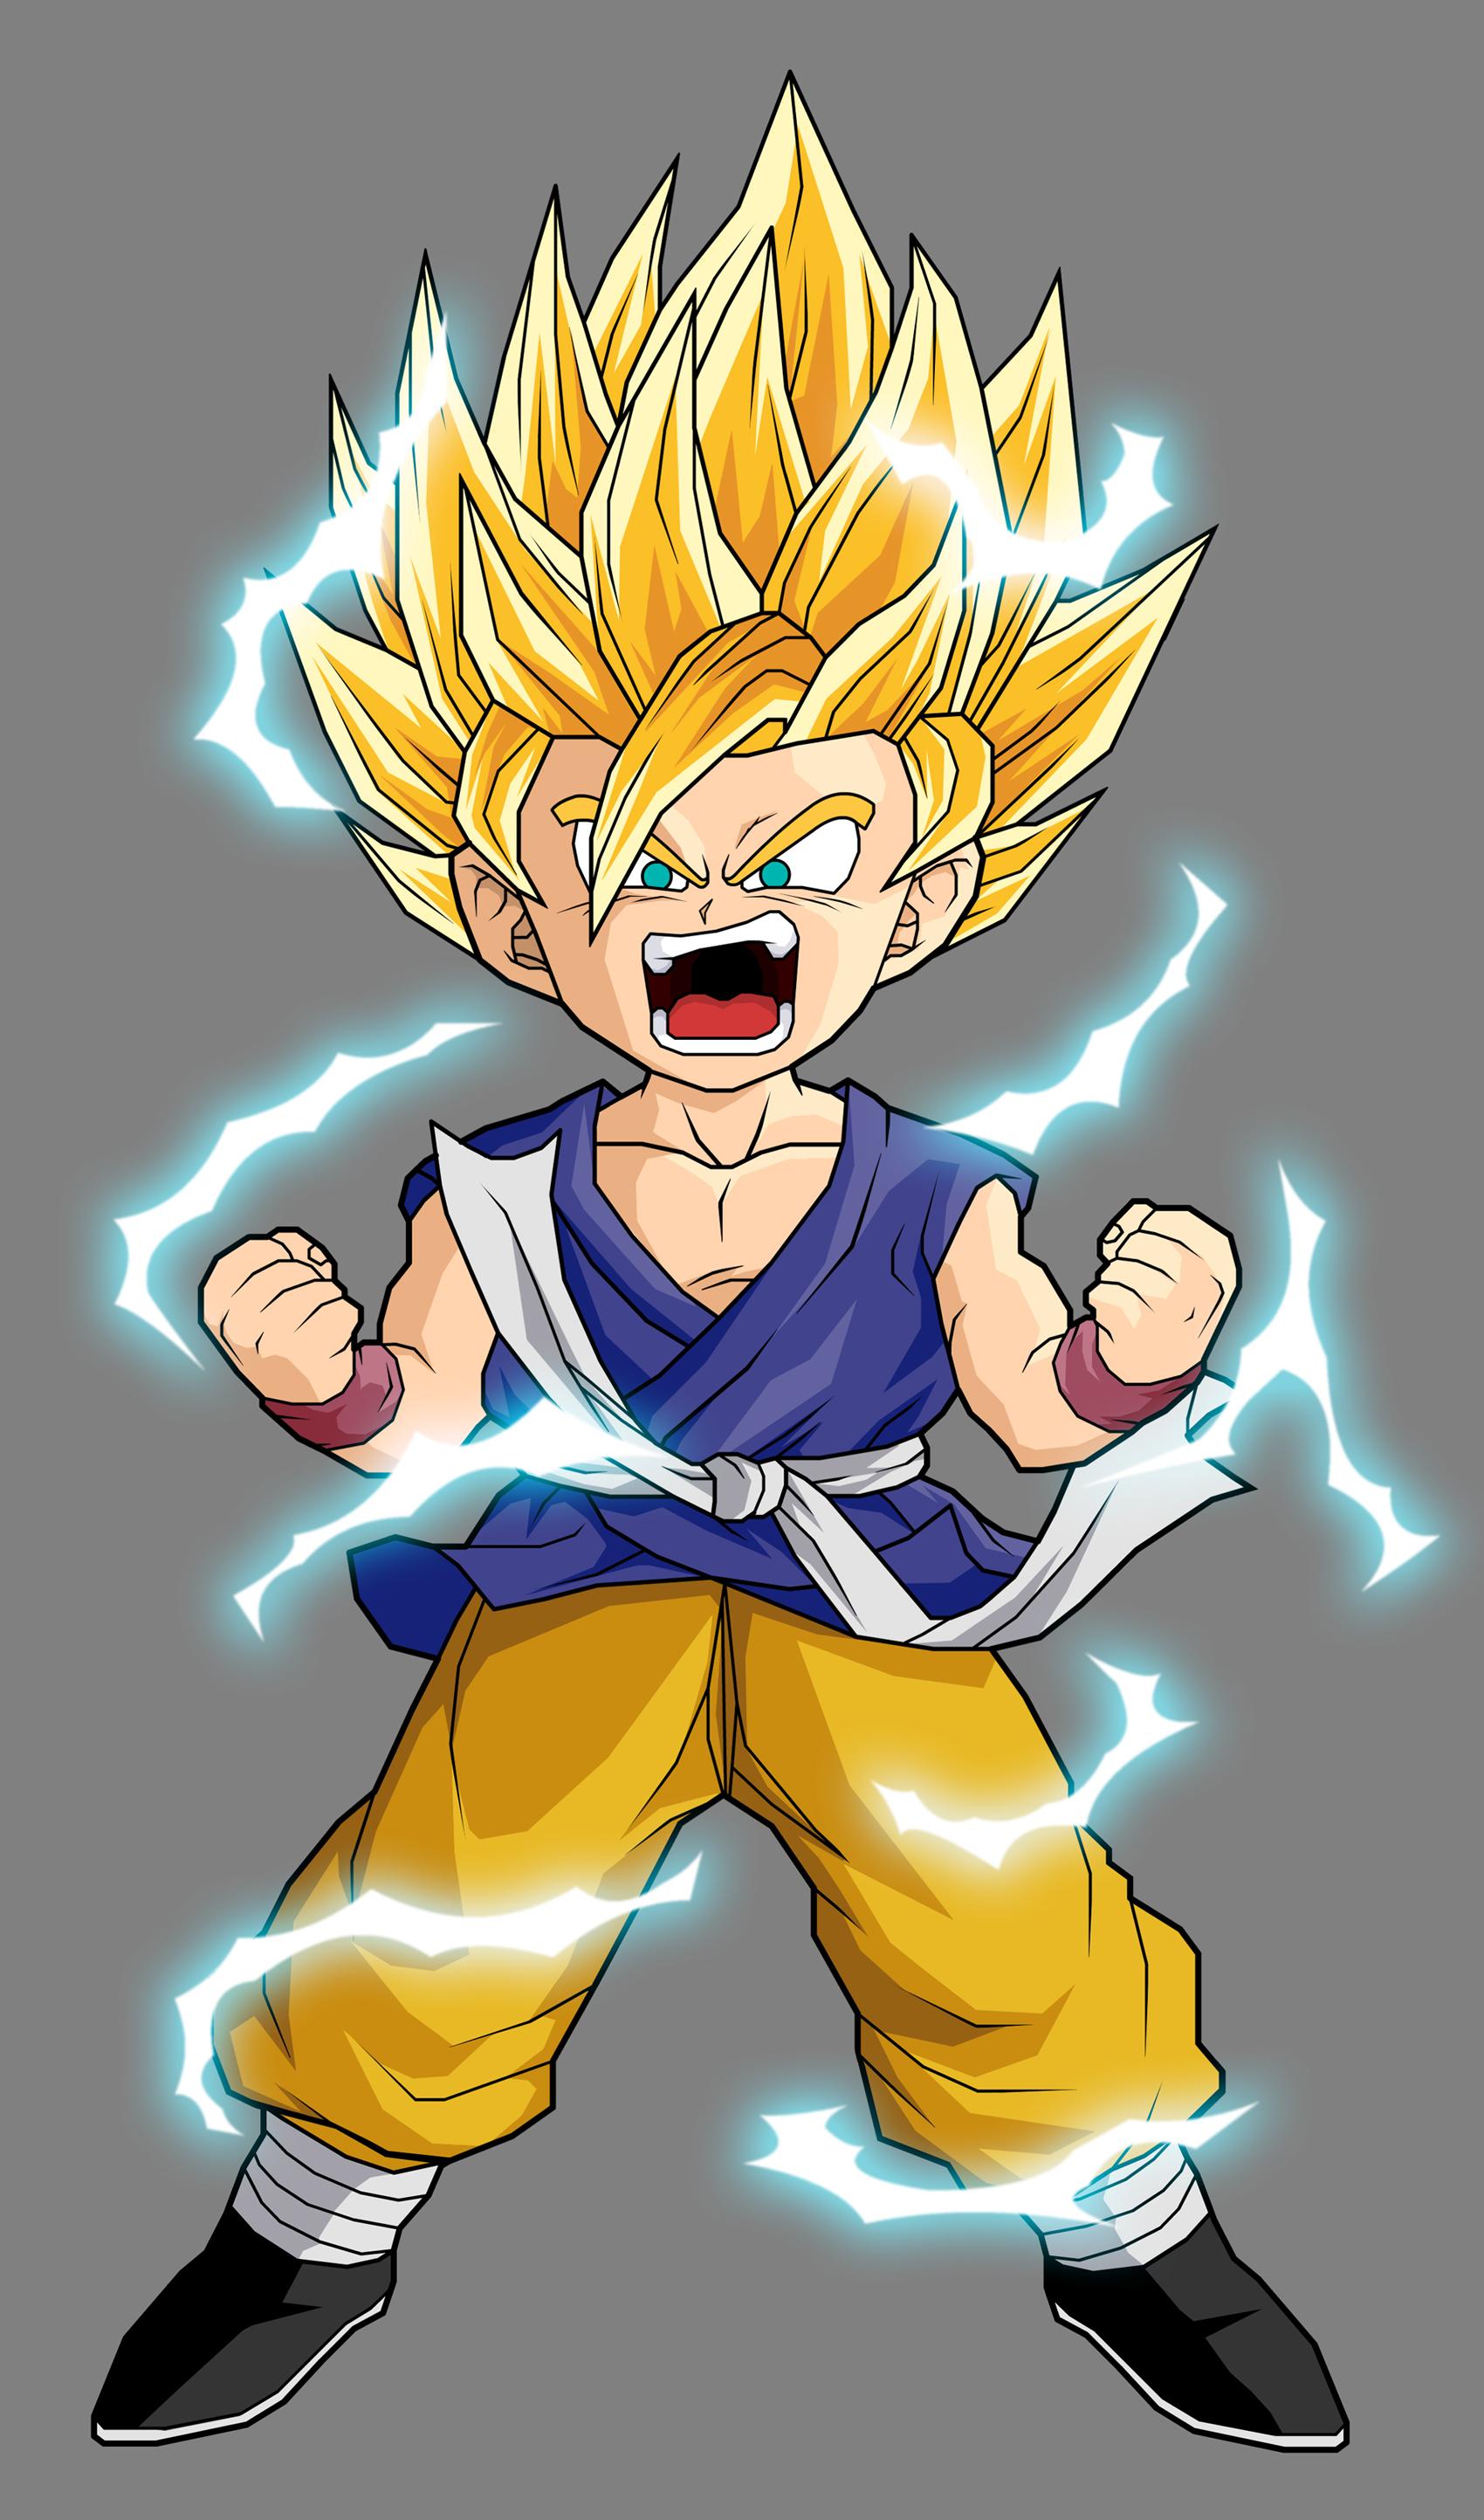 http://images.wikia.com/dragonball/es/images/8/87/20110412181524!GT_Kid_Goku_Super_Saiyan_2_by_dbzataricommunity.jpg Dragon